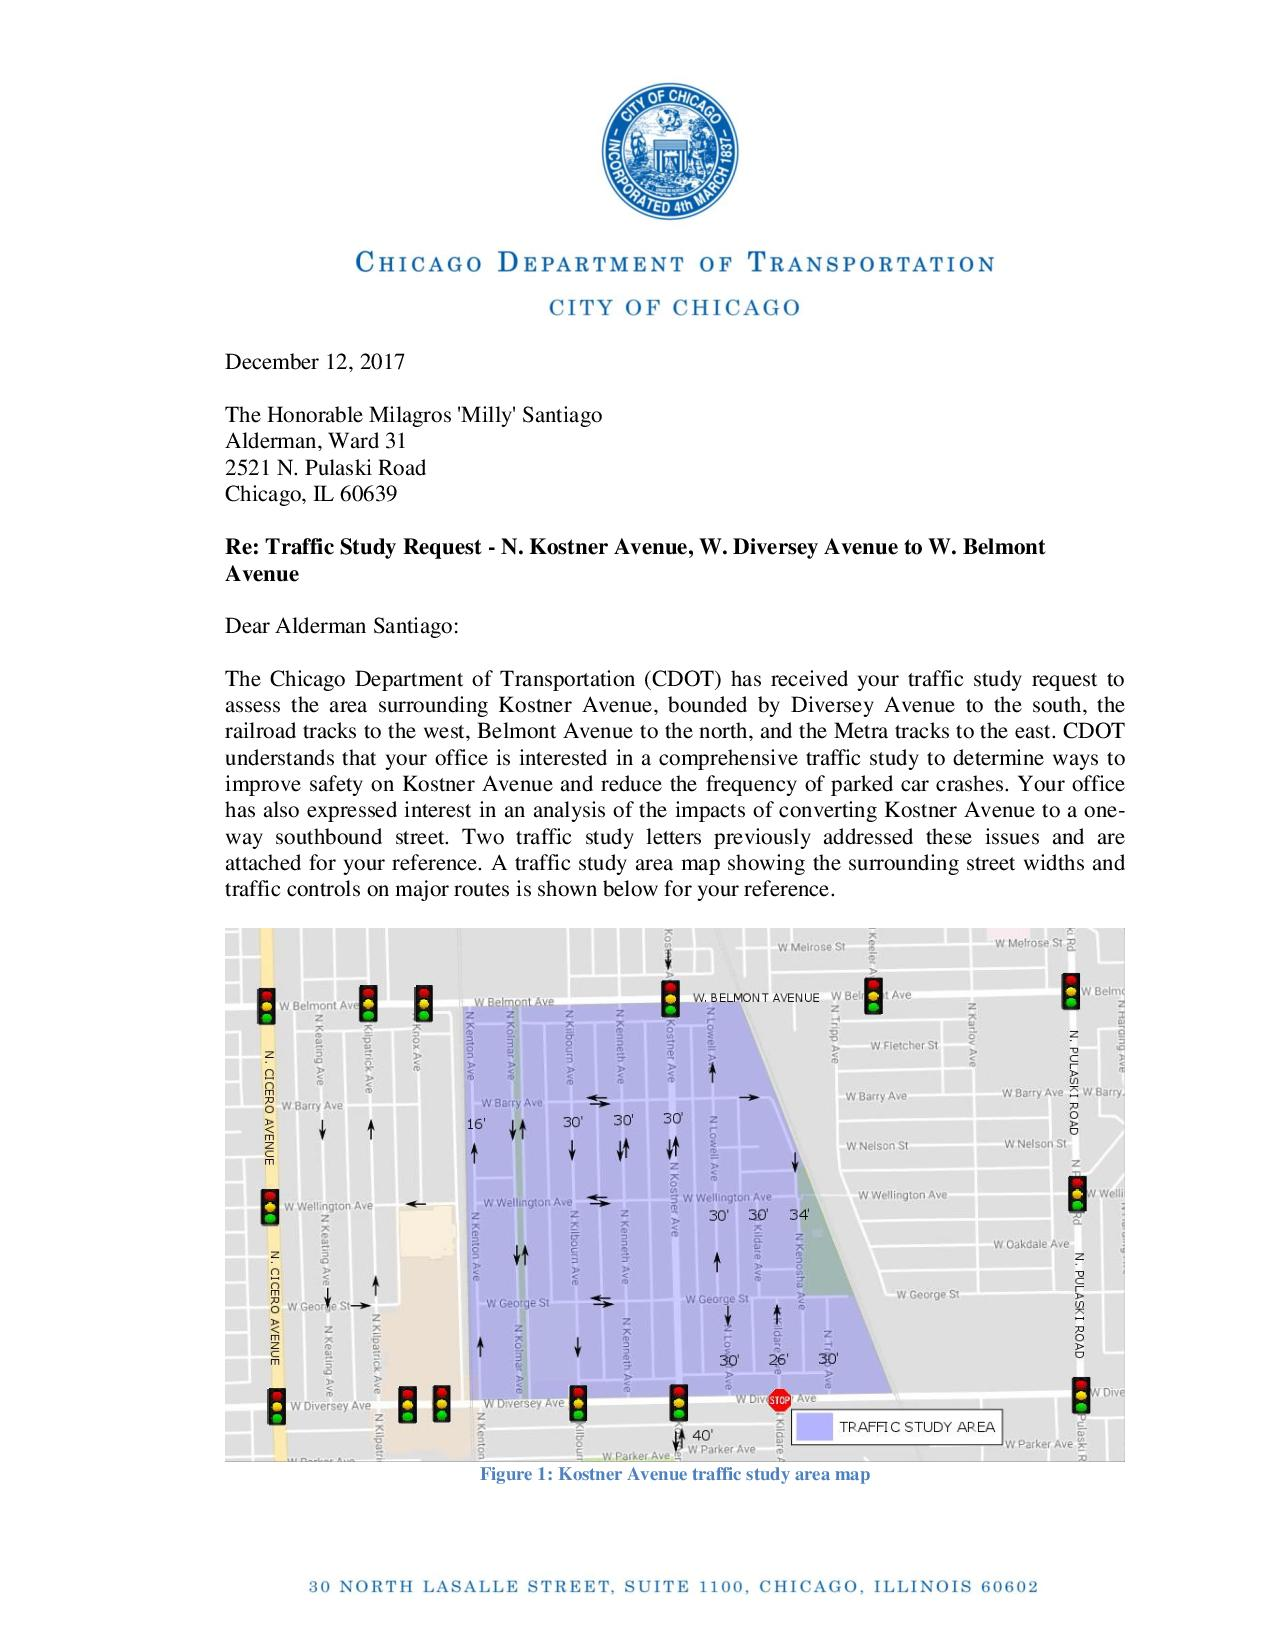 Kostner_Avenue_Traffic_Study_Letter-page-001.jpg